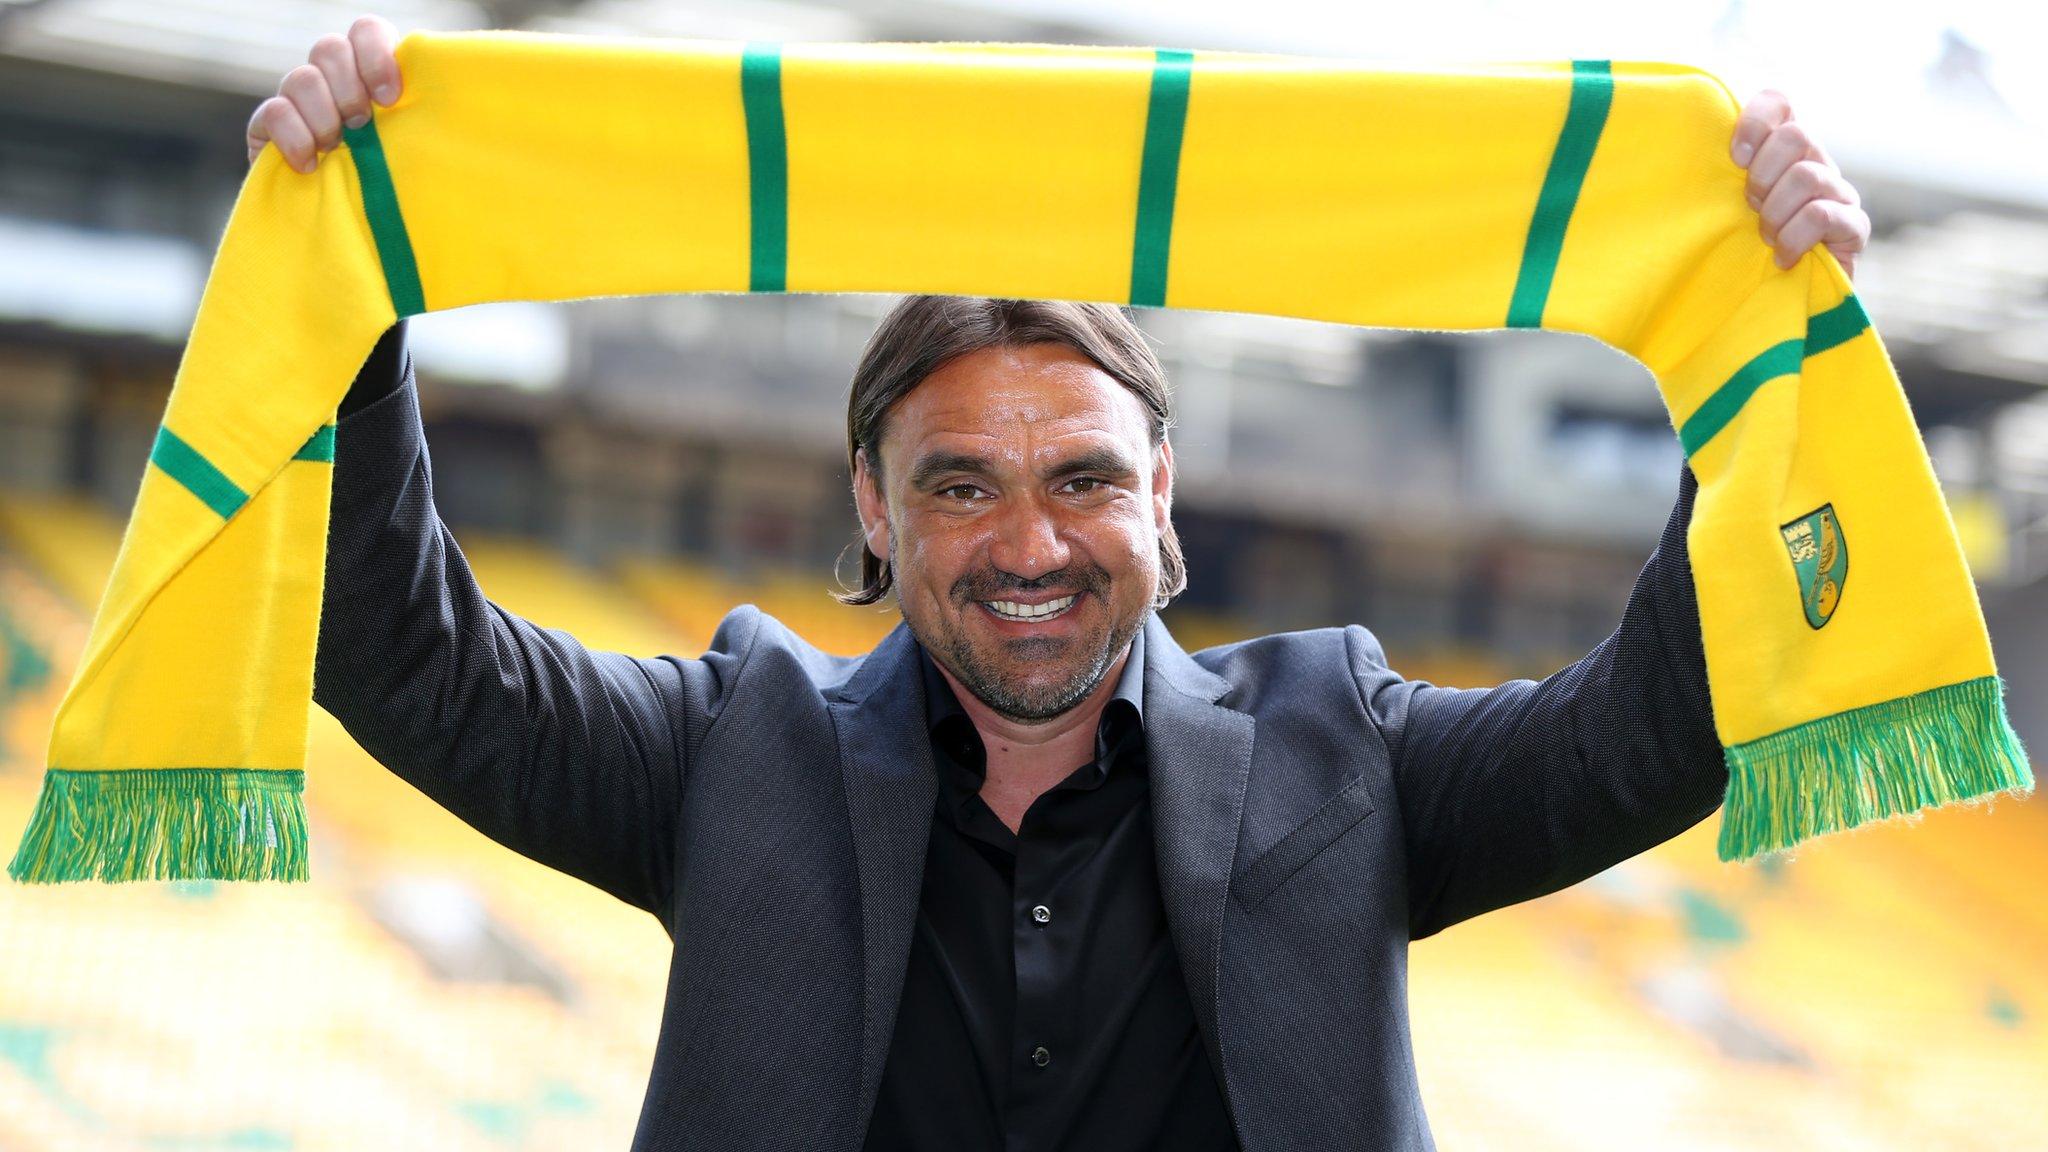 Norwich similar to Dortmund, says new boss Farke